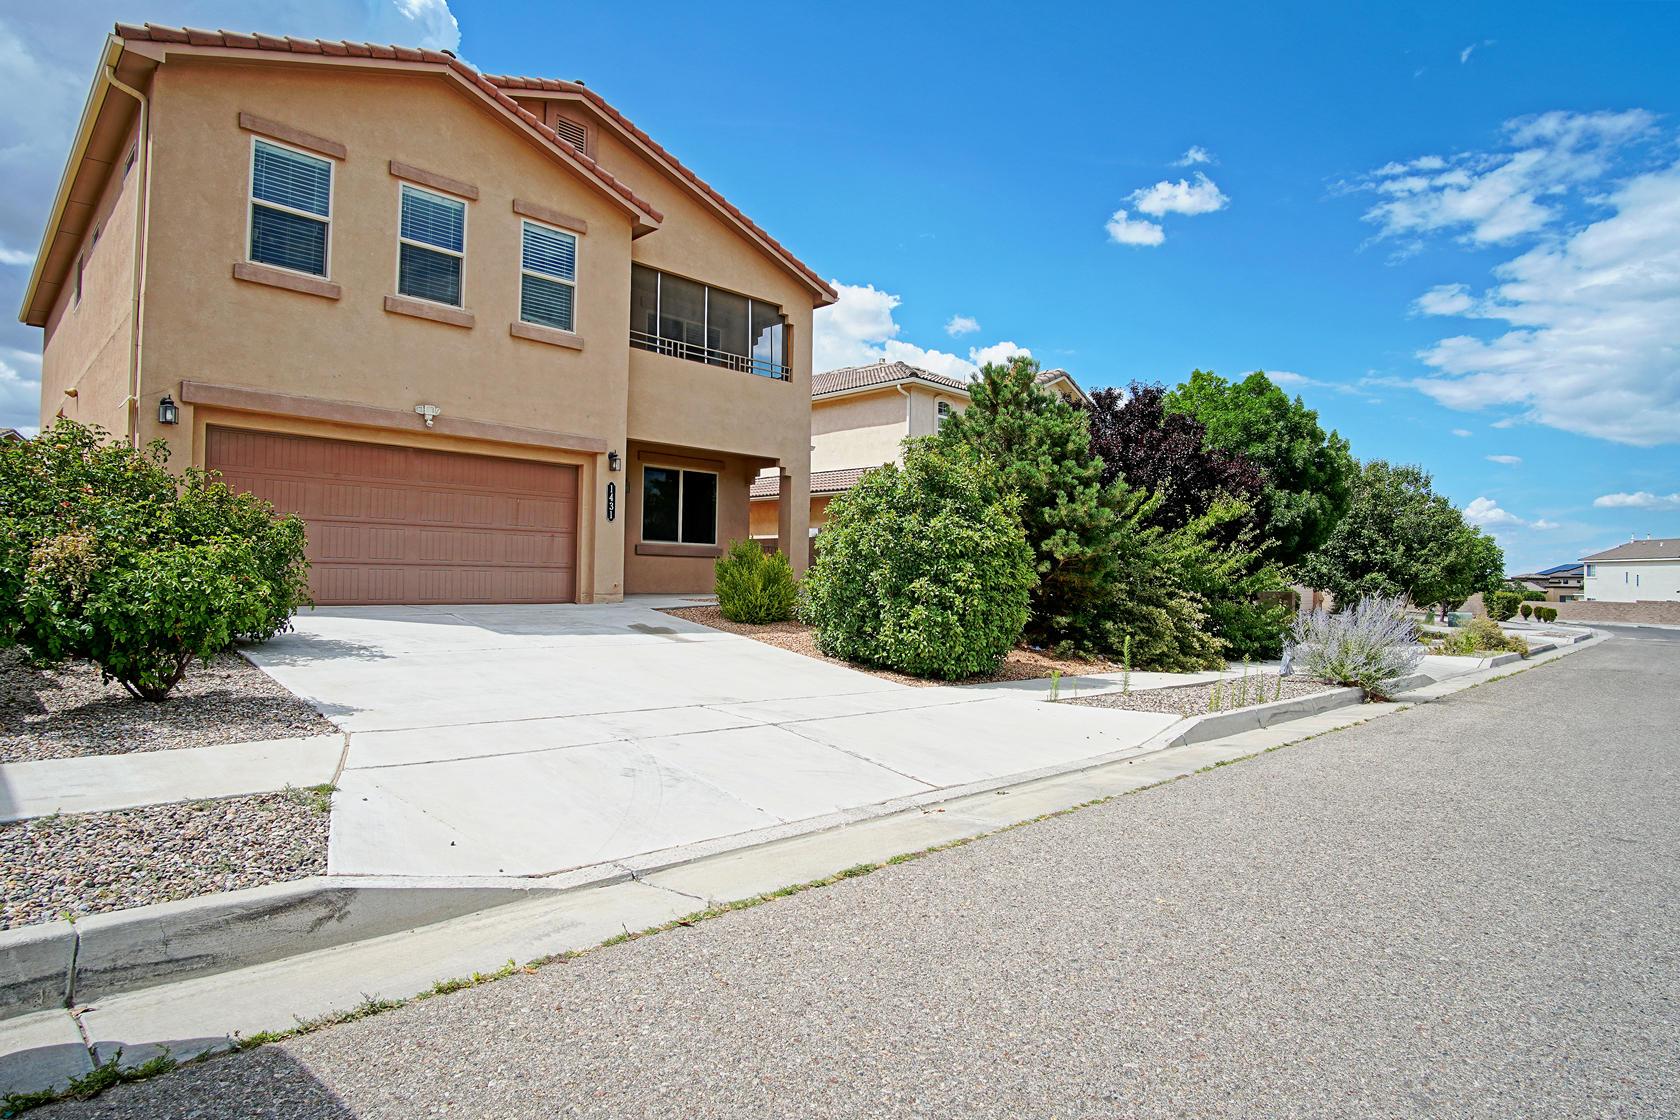 1431 NW Windridge Drive, Northwest Albuquerque and Northwest Heights, New Mexico